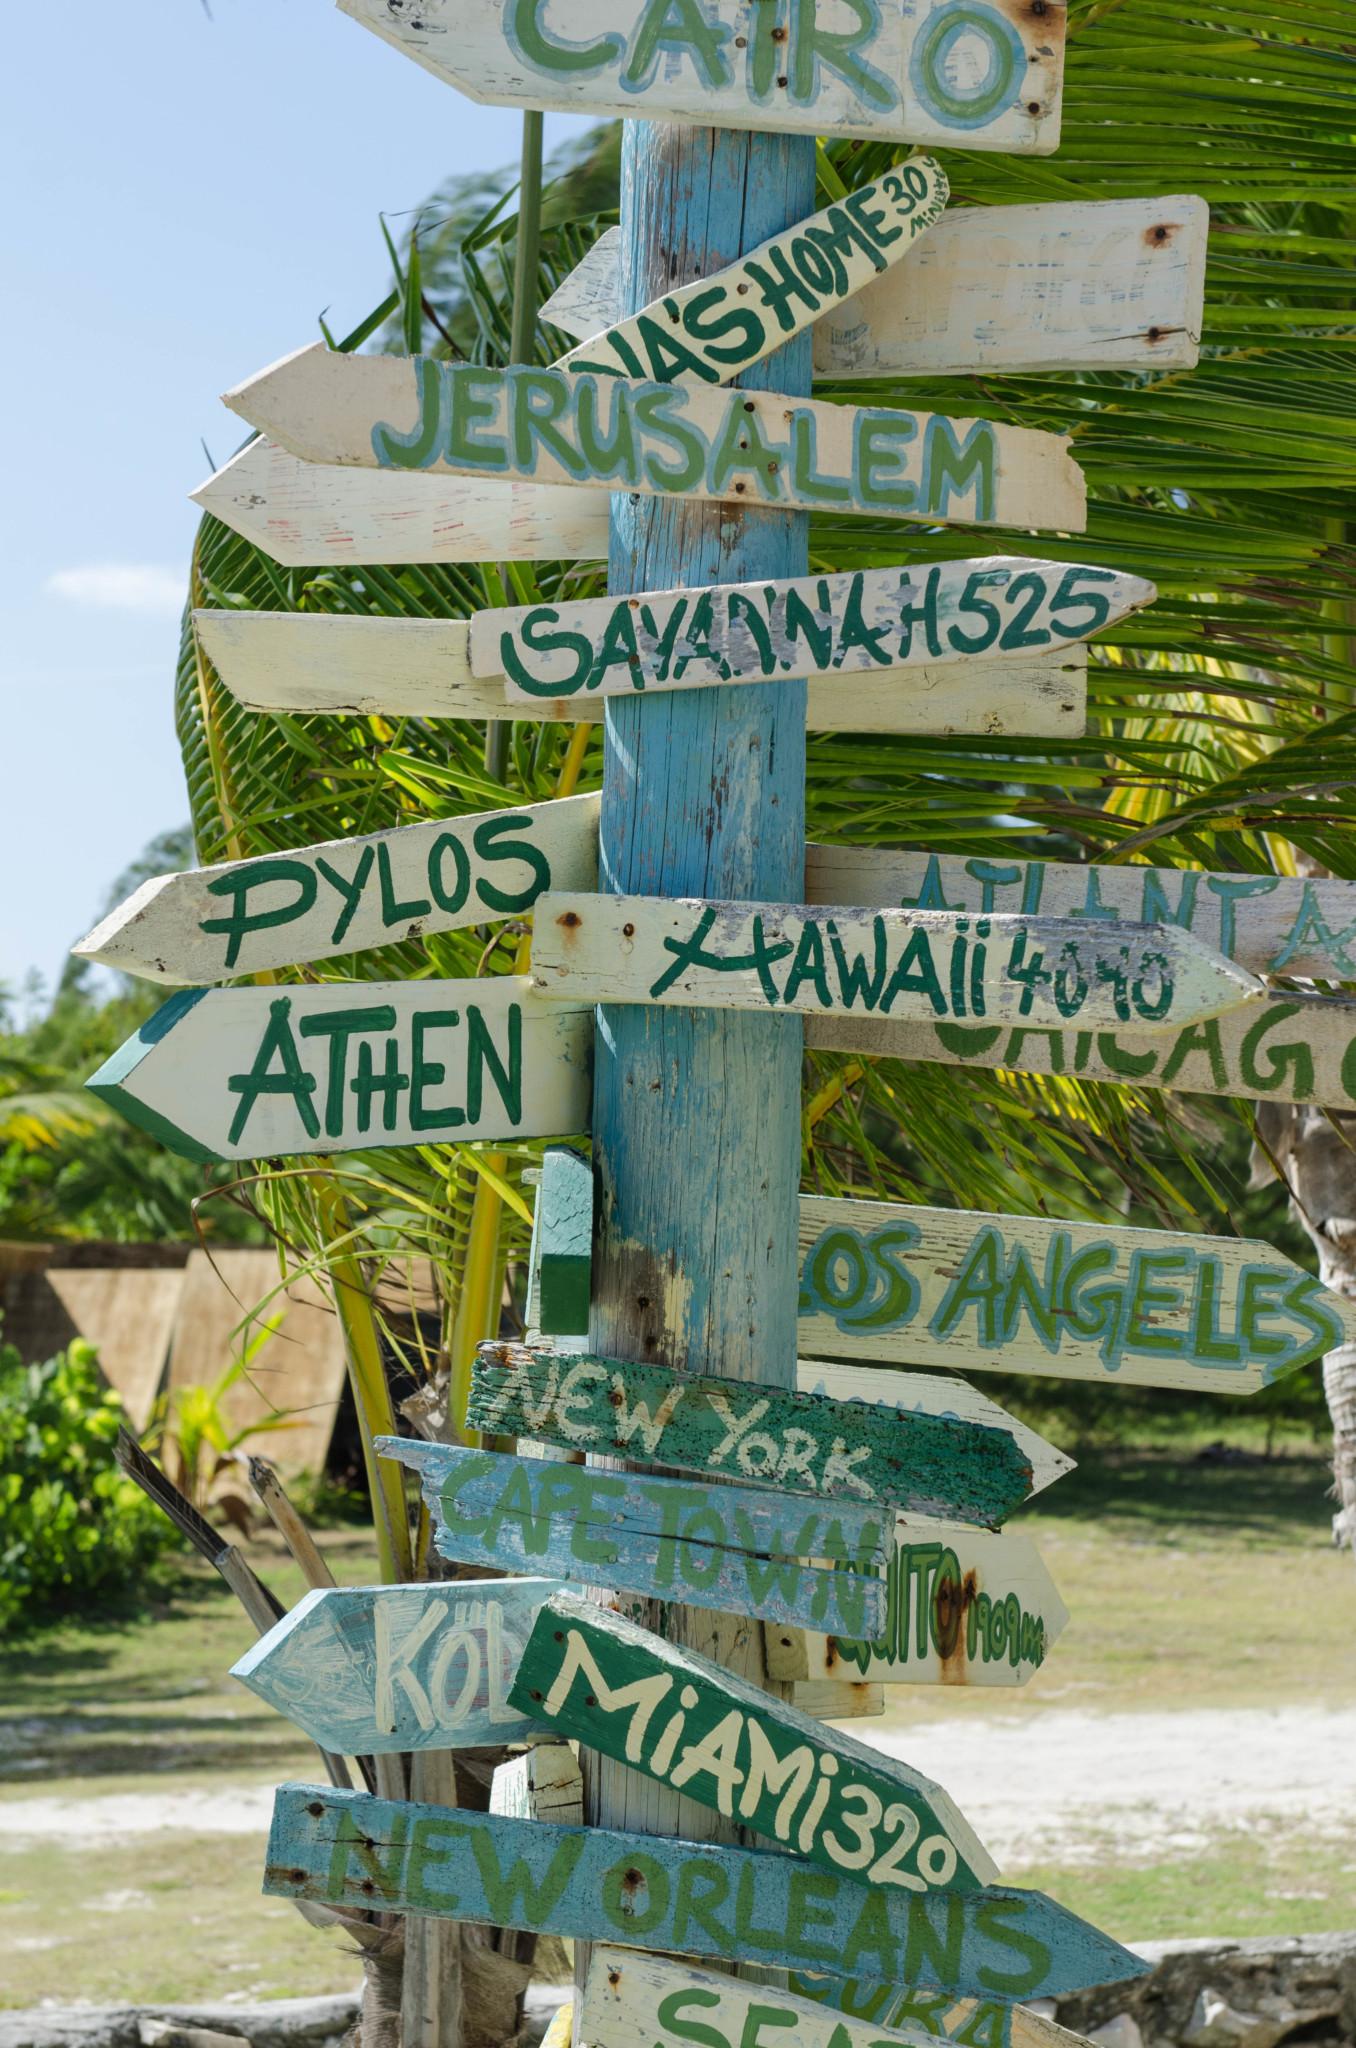 Wegweiser auf Cat Island